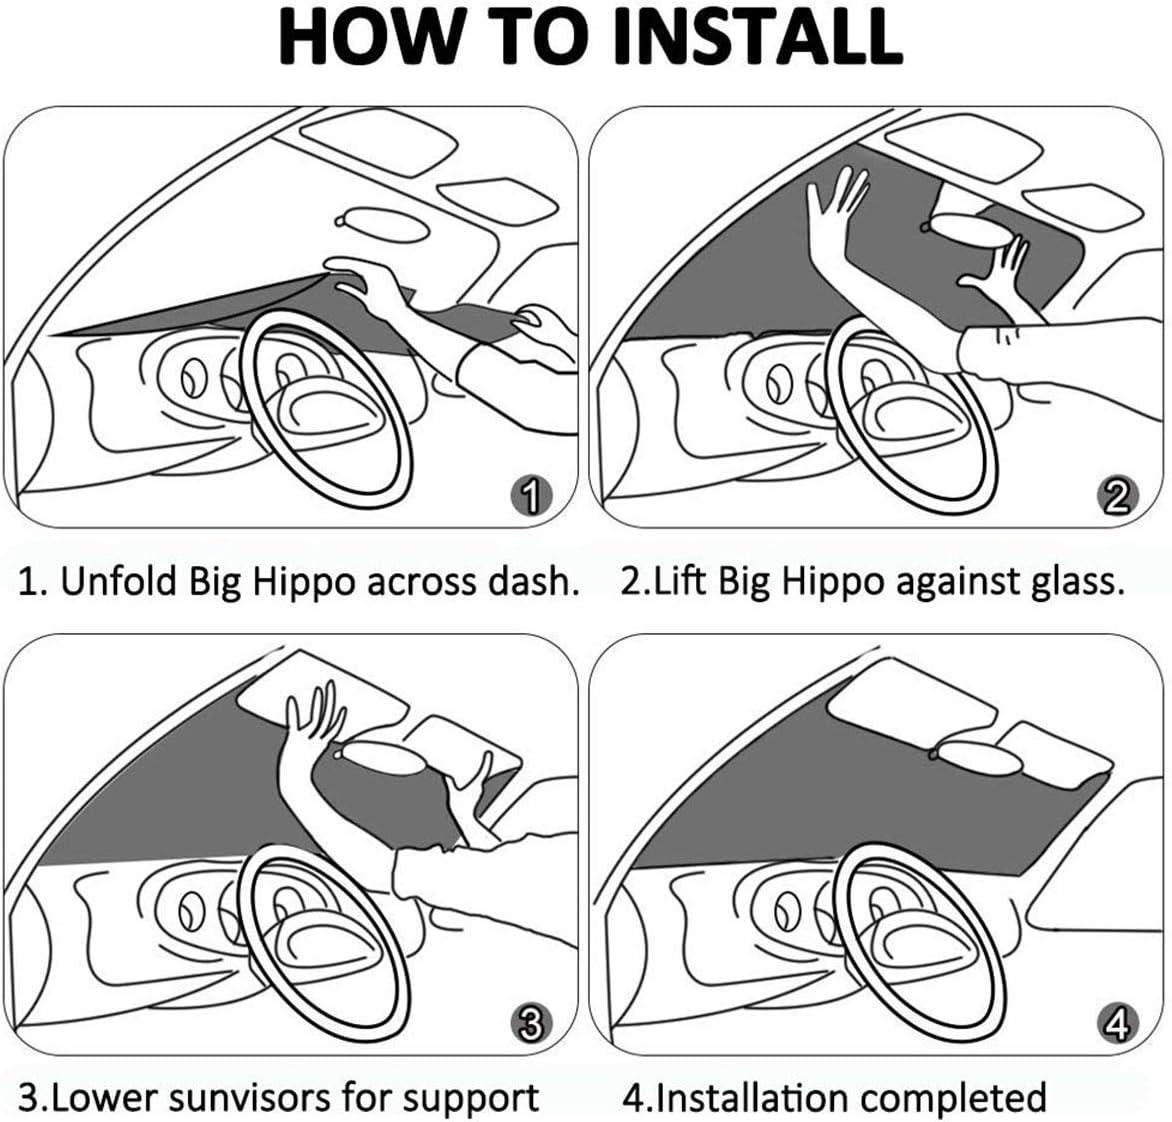 130cm MOLLUDY Car Windshield Sunshade Blocks UV Rays Sun Visor Protector Cutest Yorkies Blocks Sunshade To Keep Your Vehicle Cool And Damage Free 70